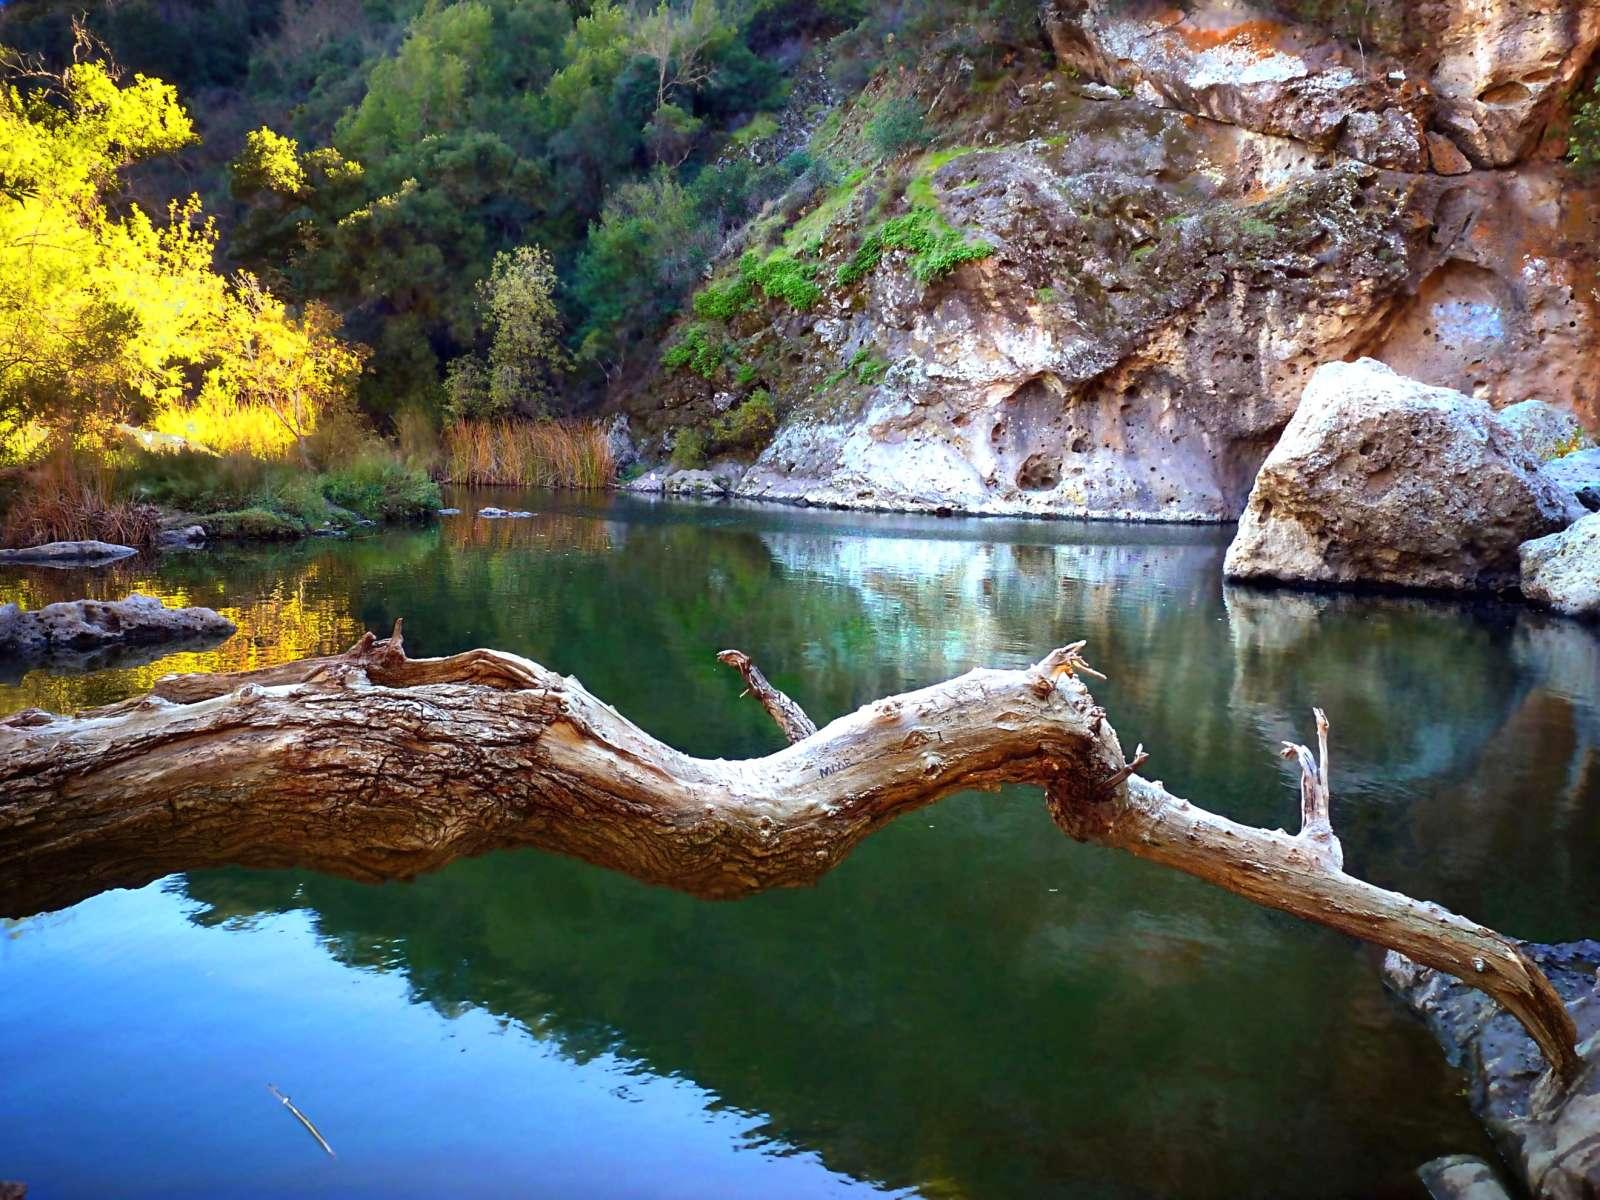 Malibu Creek State Park Camping